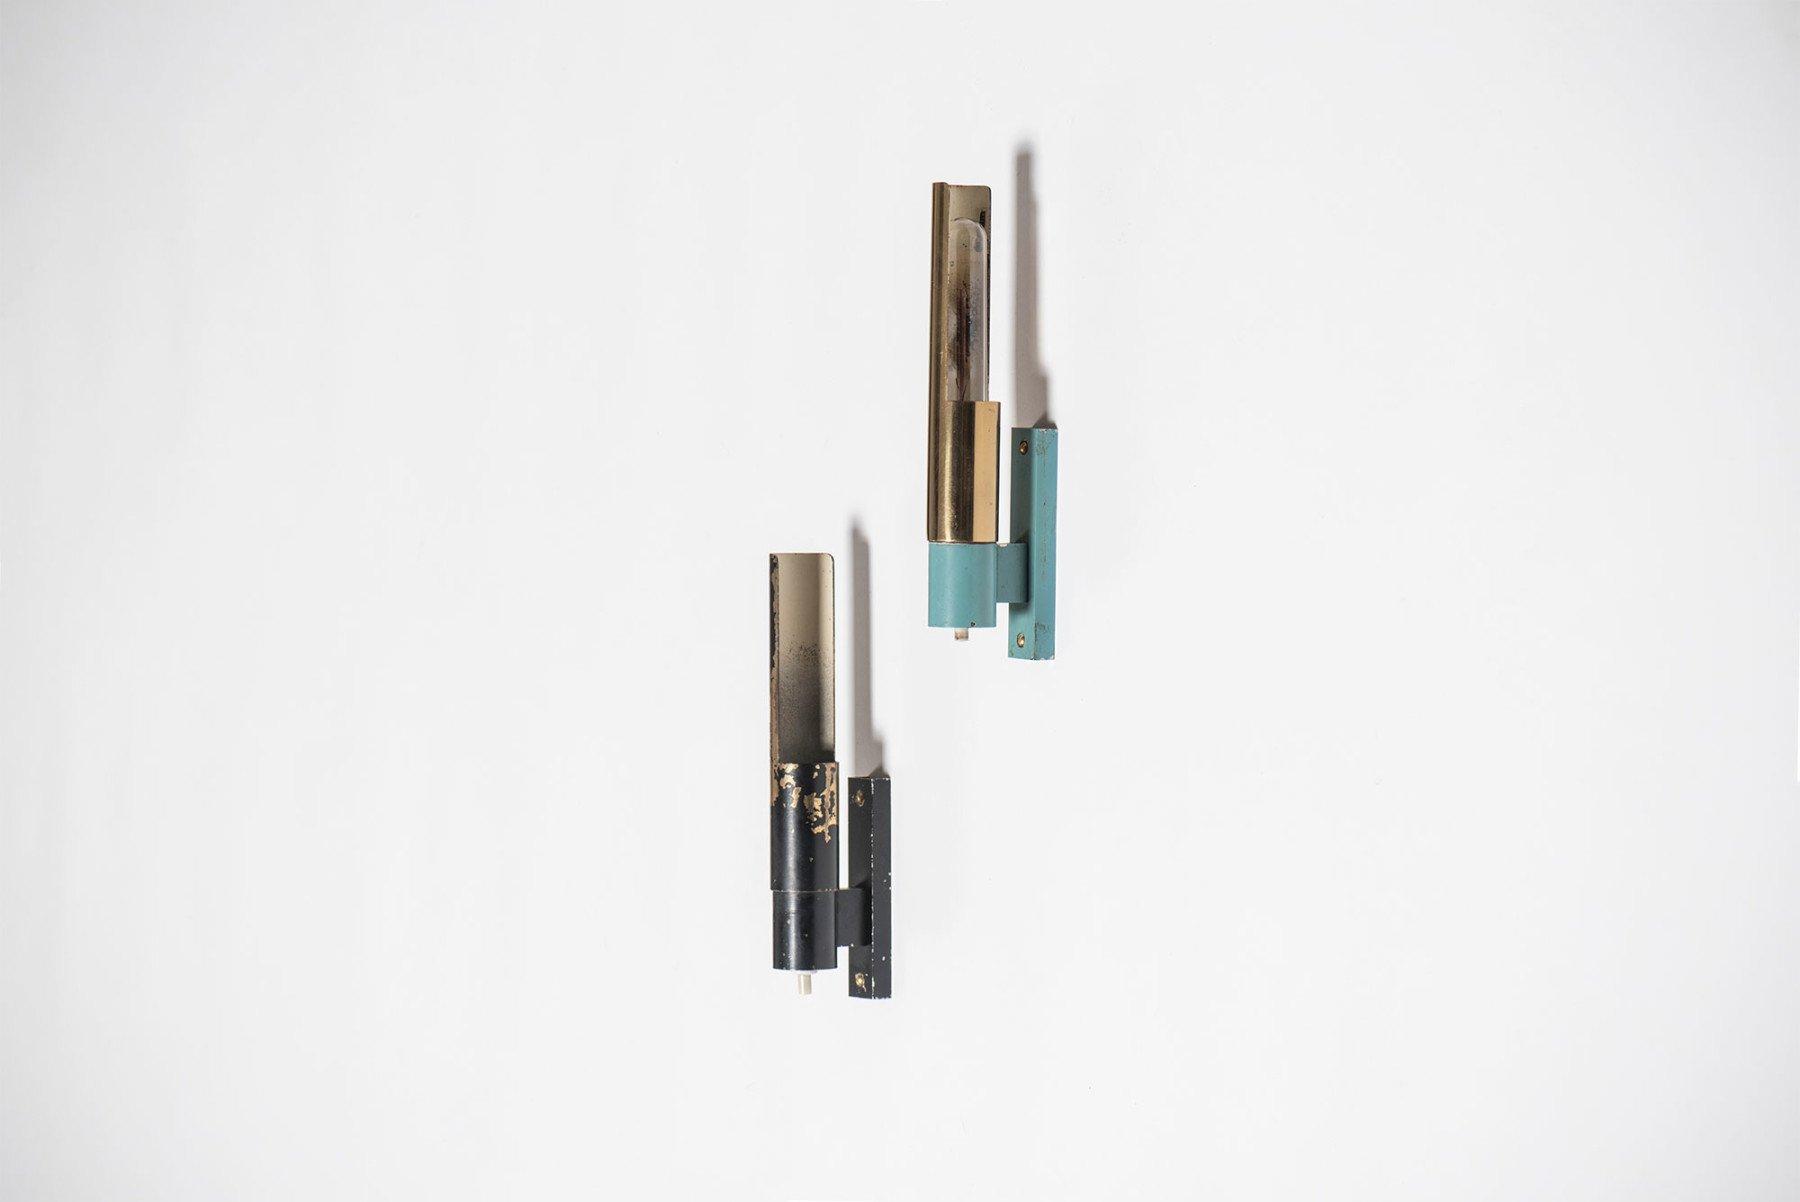 Gino Sarfatti |   Wall light, model 211 - pair